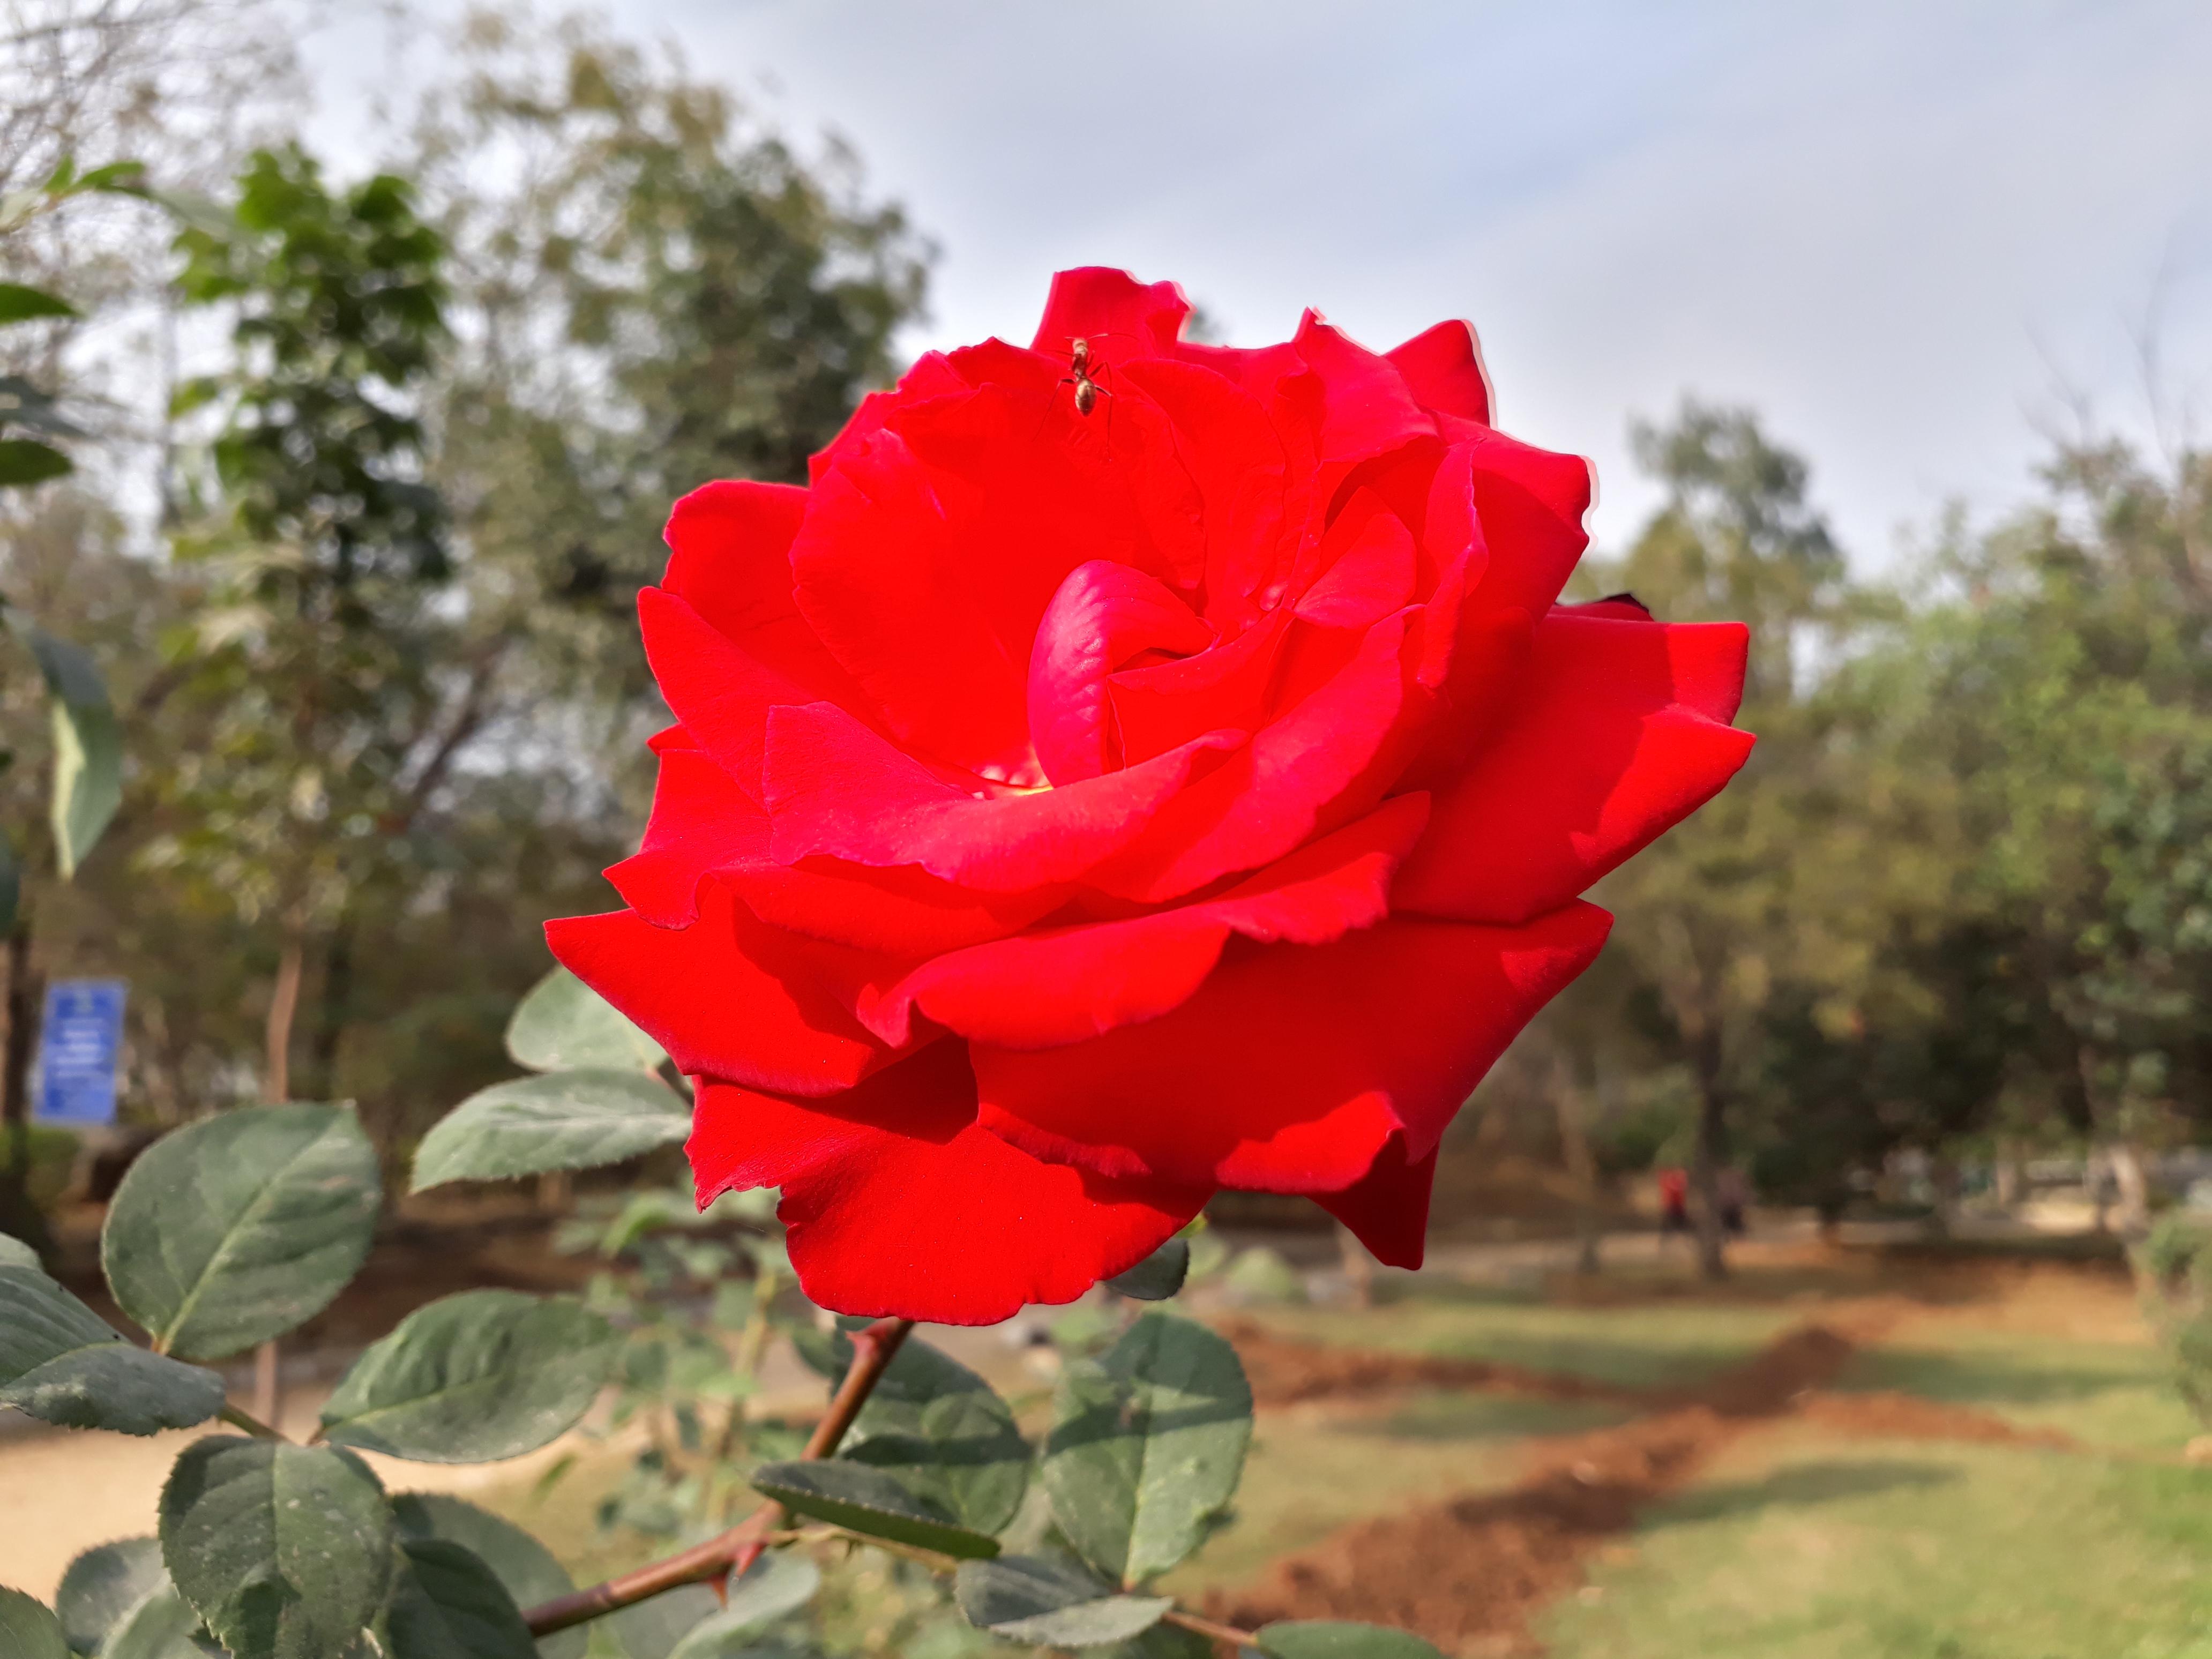 Free Images Red Rose Nature Flower Rose Family Garden Roses